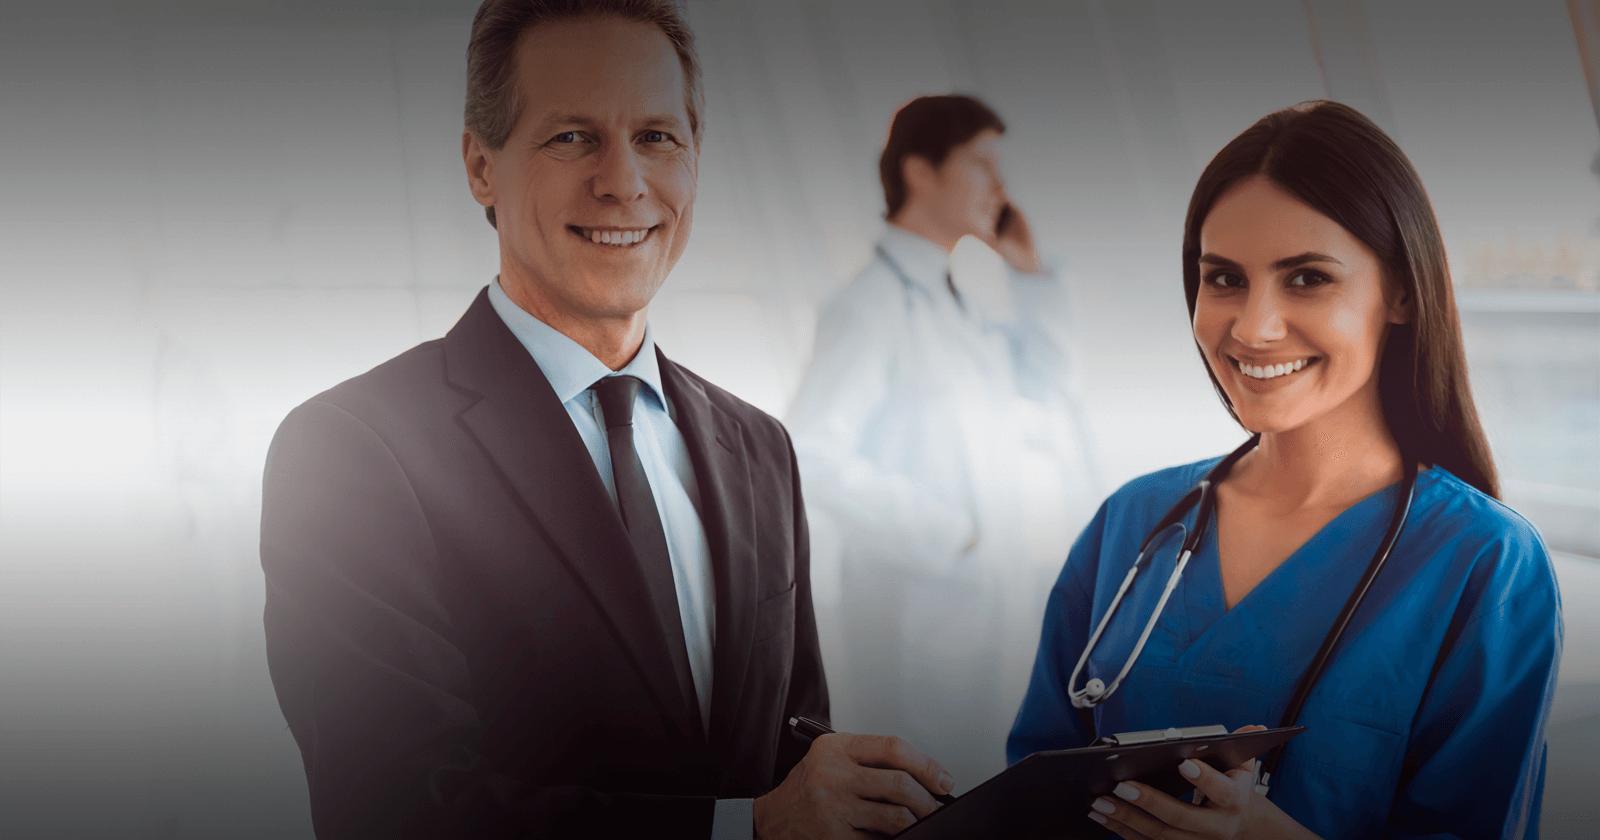 Diplomado innovaci n educativa en salud